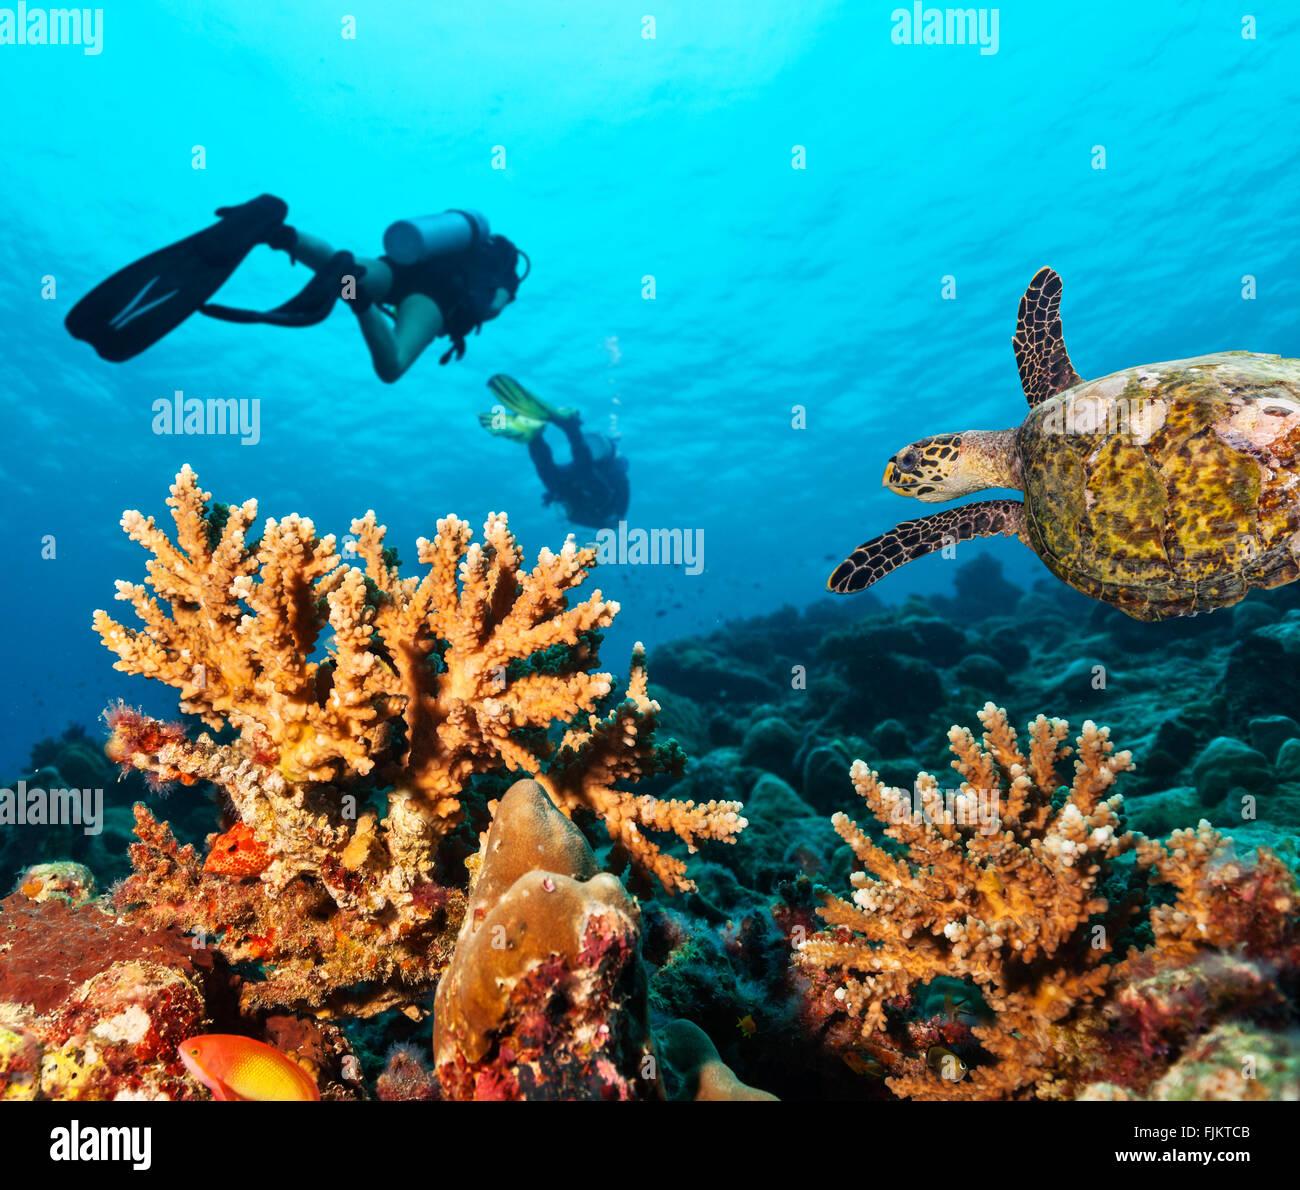 Scuba divers explore a coral reef - Stock Image